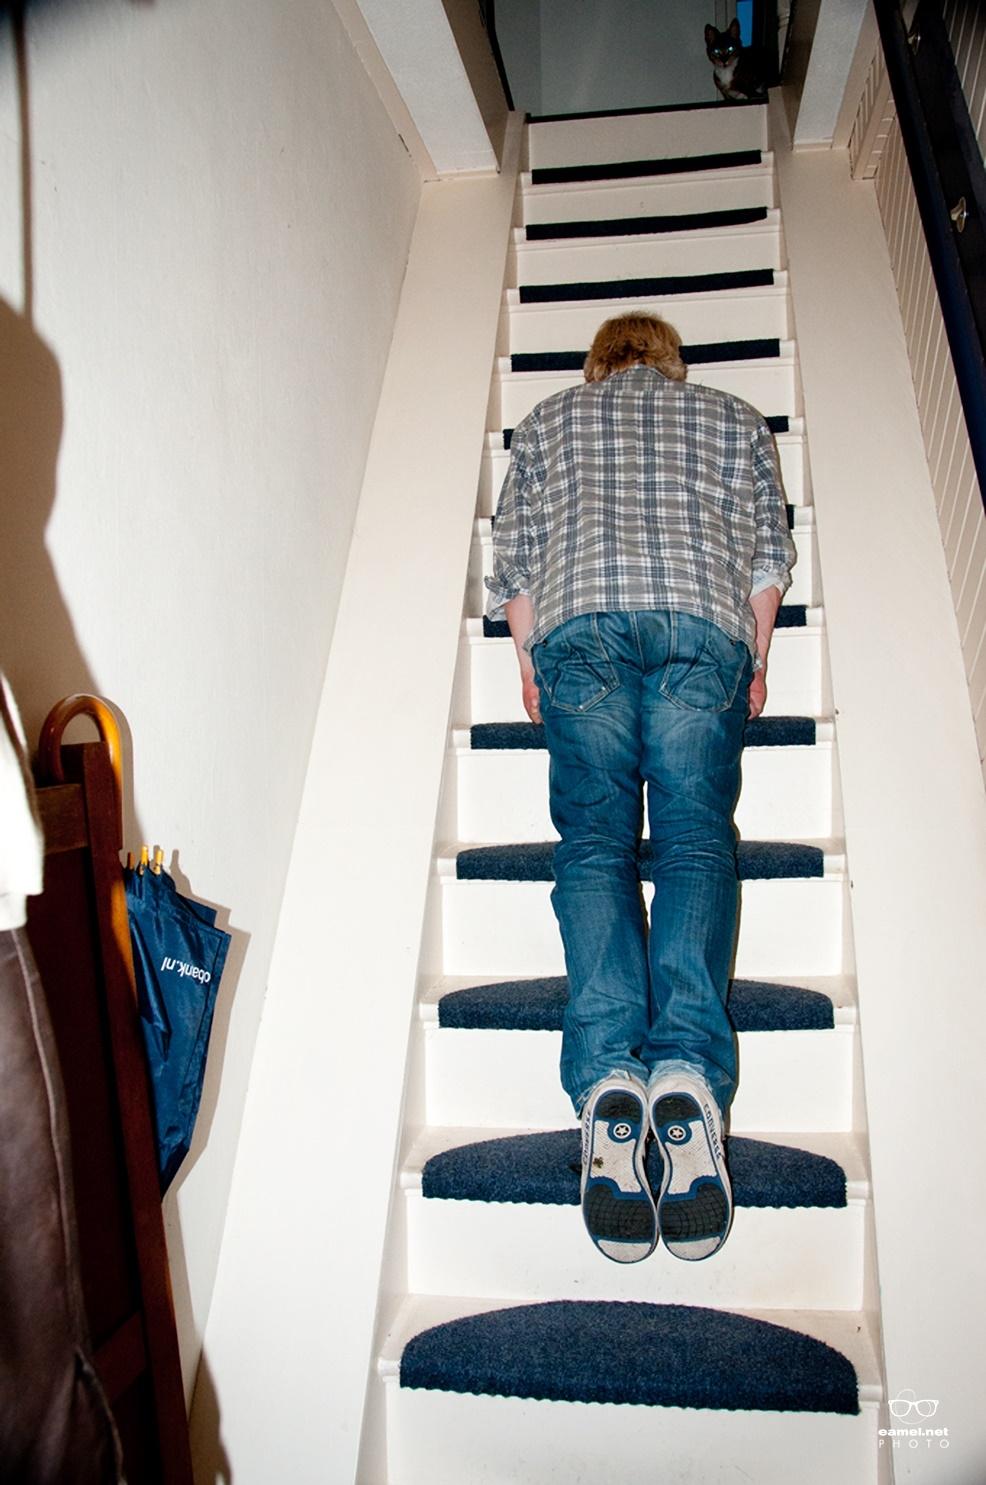 planking grut6 - Zoek de plank